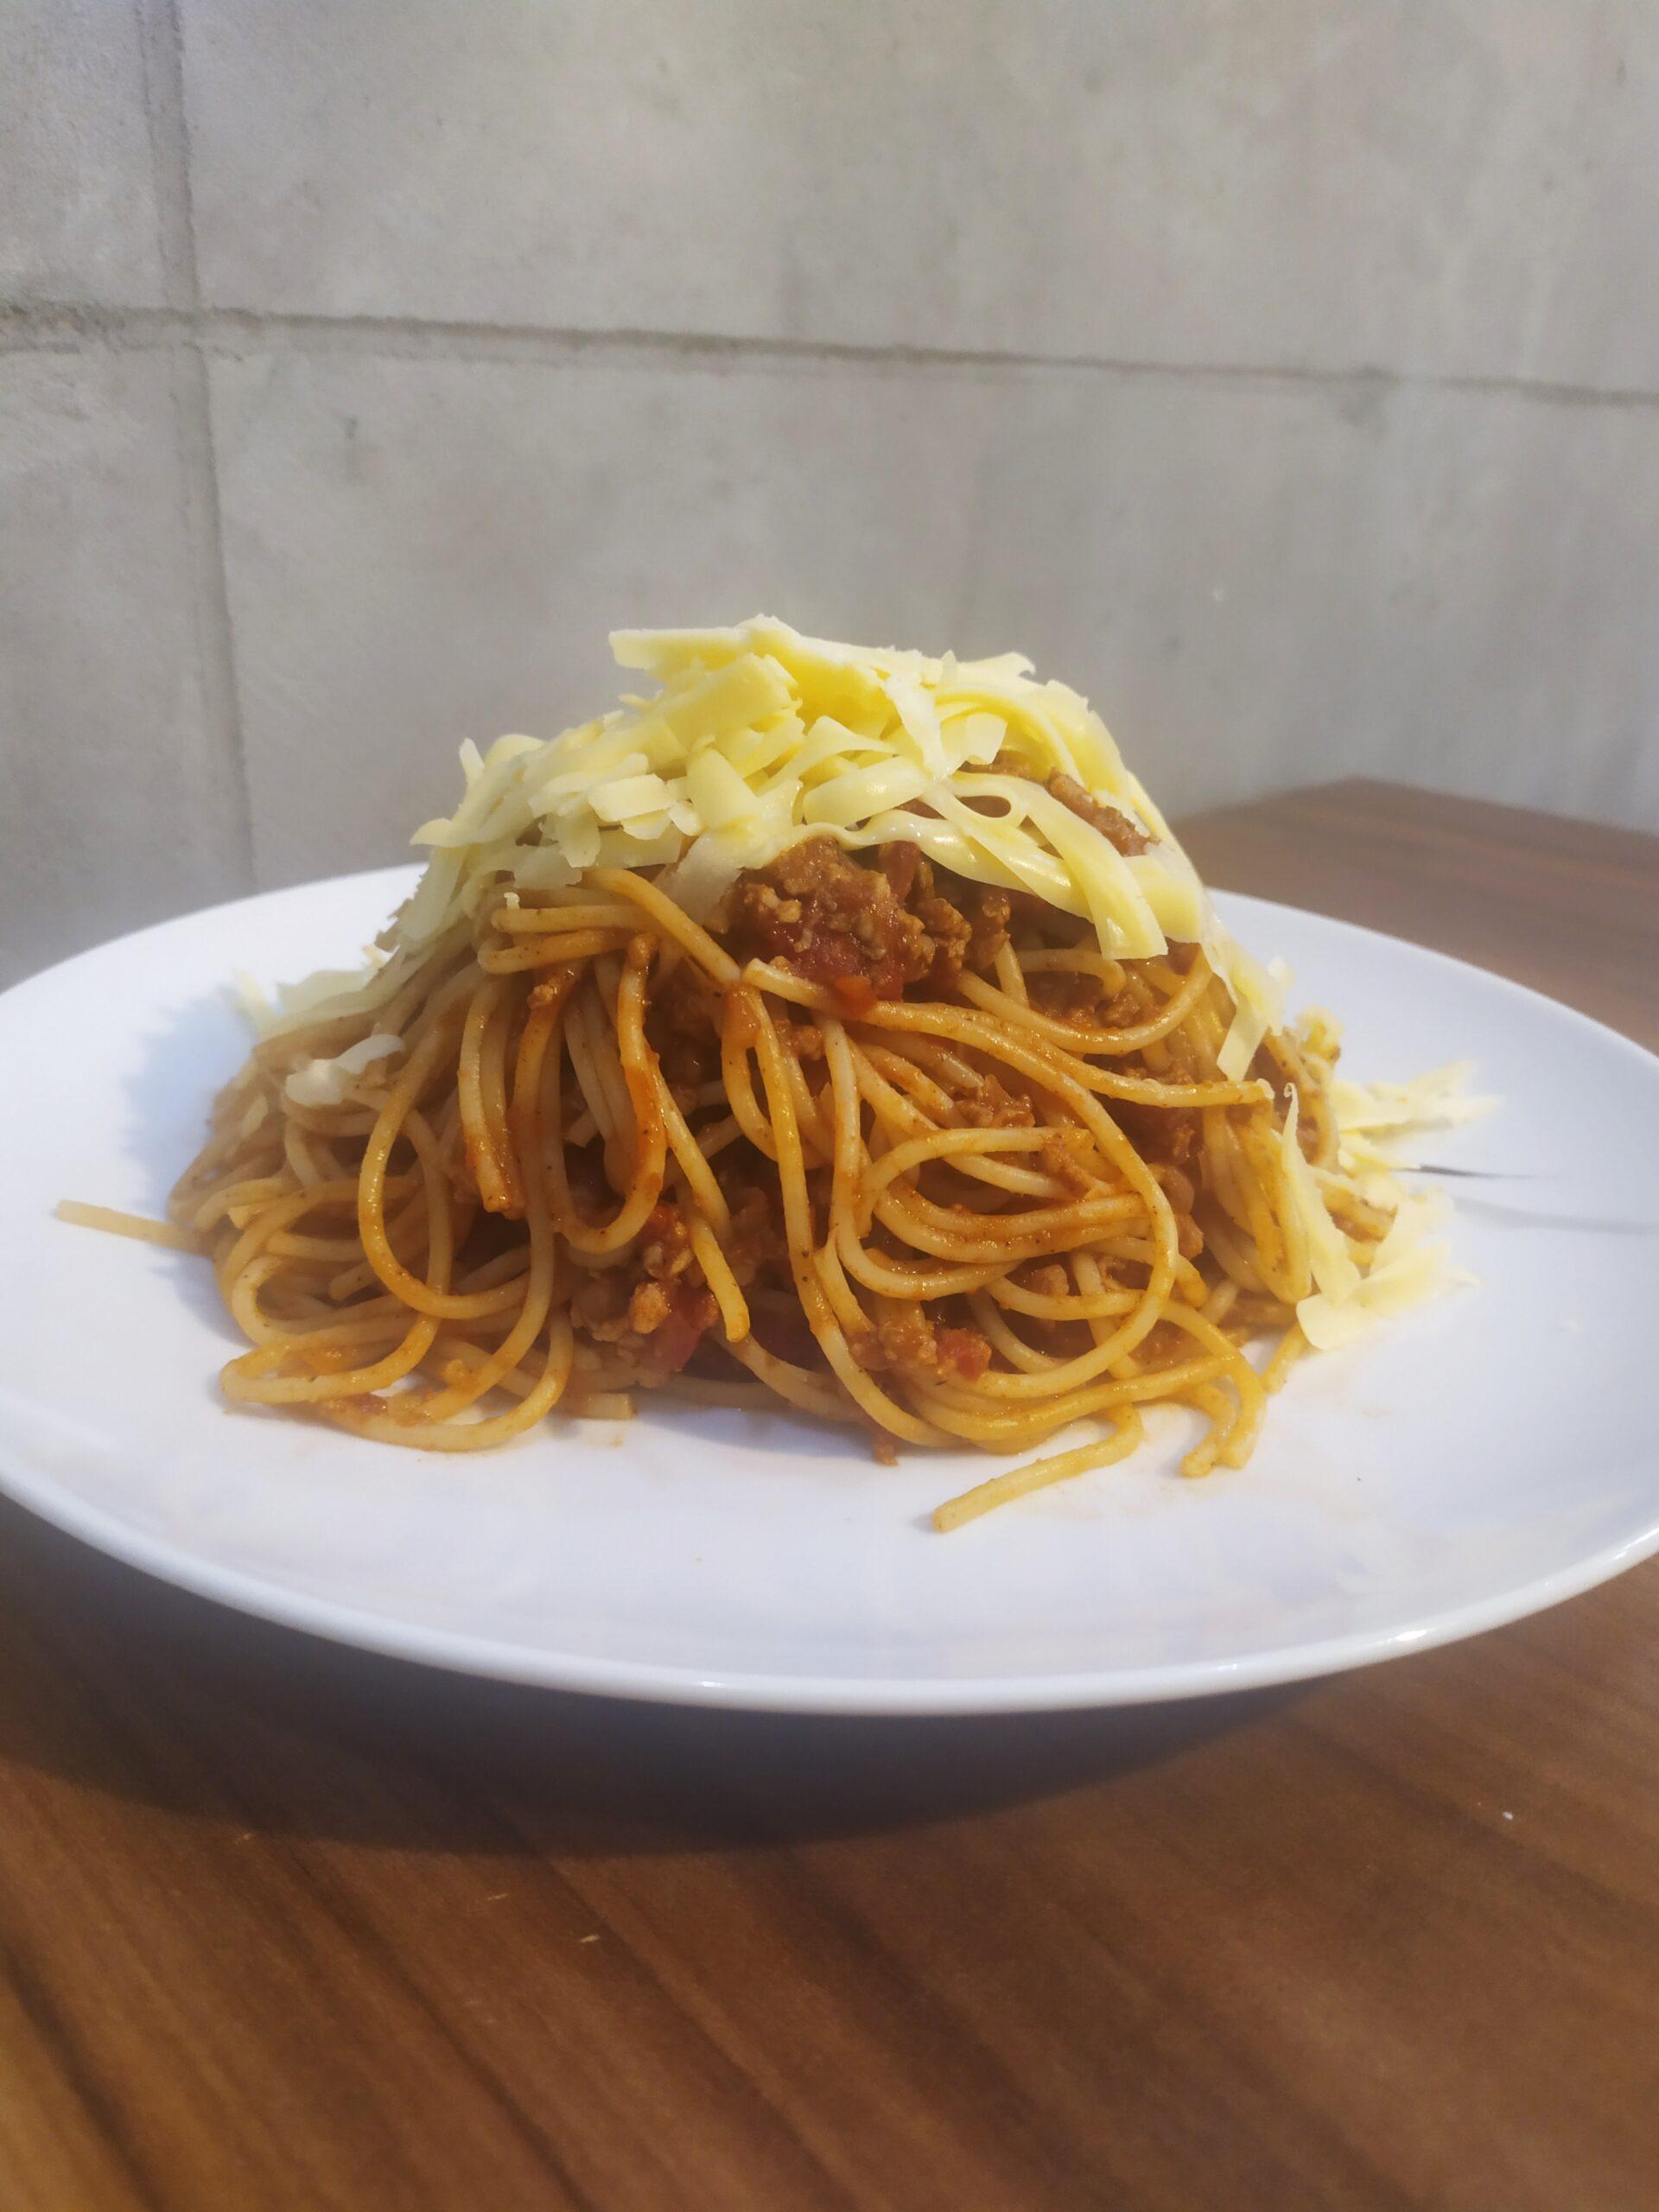 Spaghetti posypane parmezanem